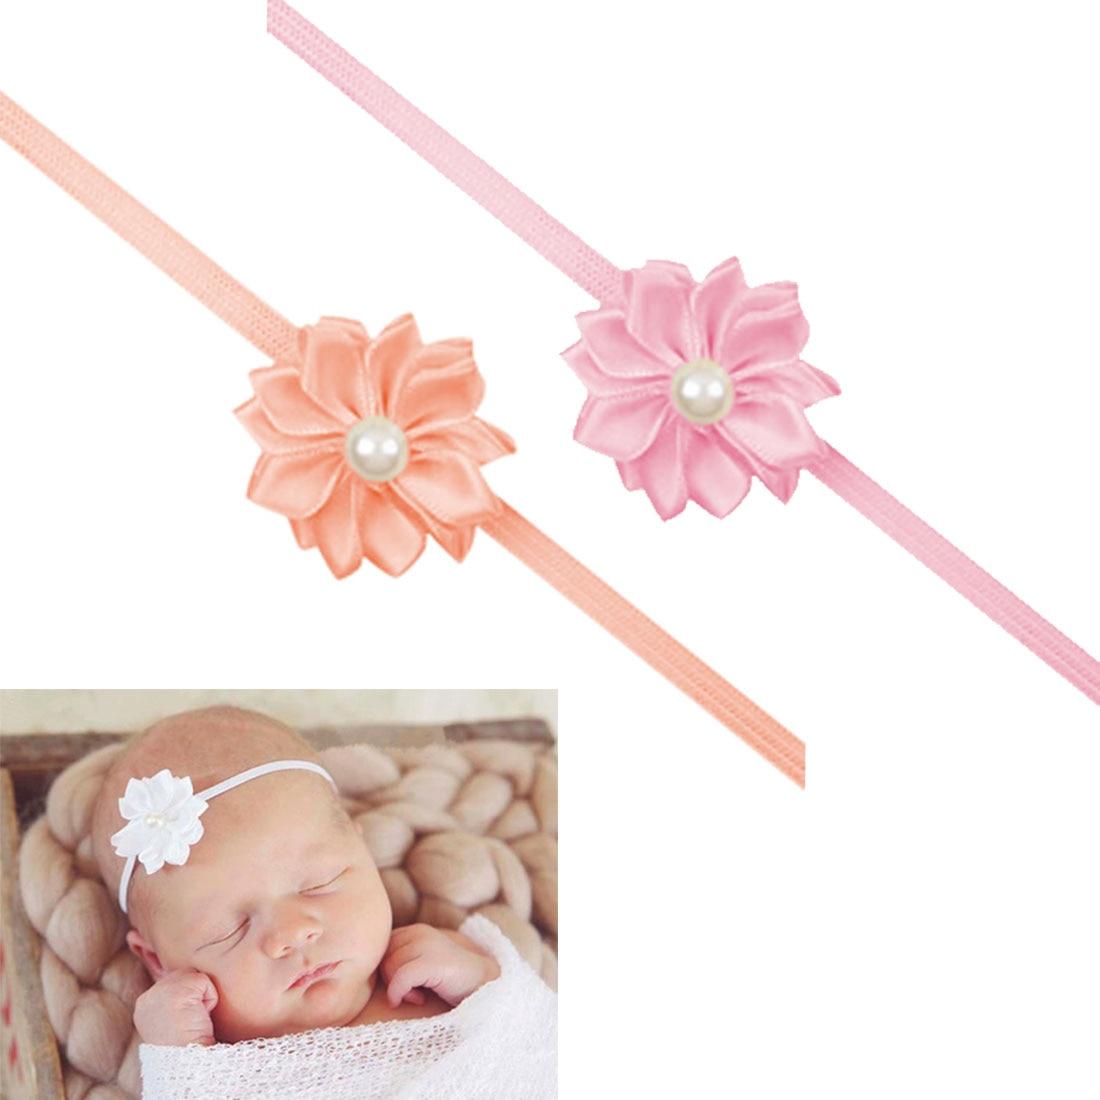 Baby Headband Mini Satin Ribbon Flowers Pearl Headband Girl Newborn Elastic Hair Band Polygon Headwear Children Hair Accessories